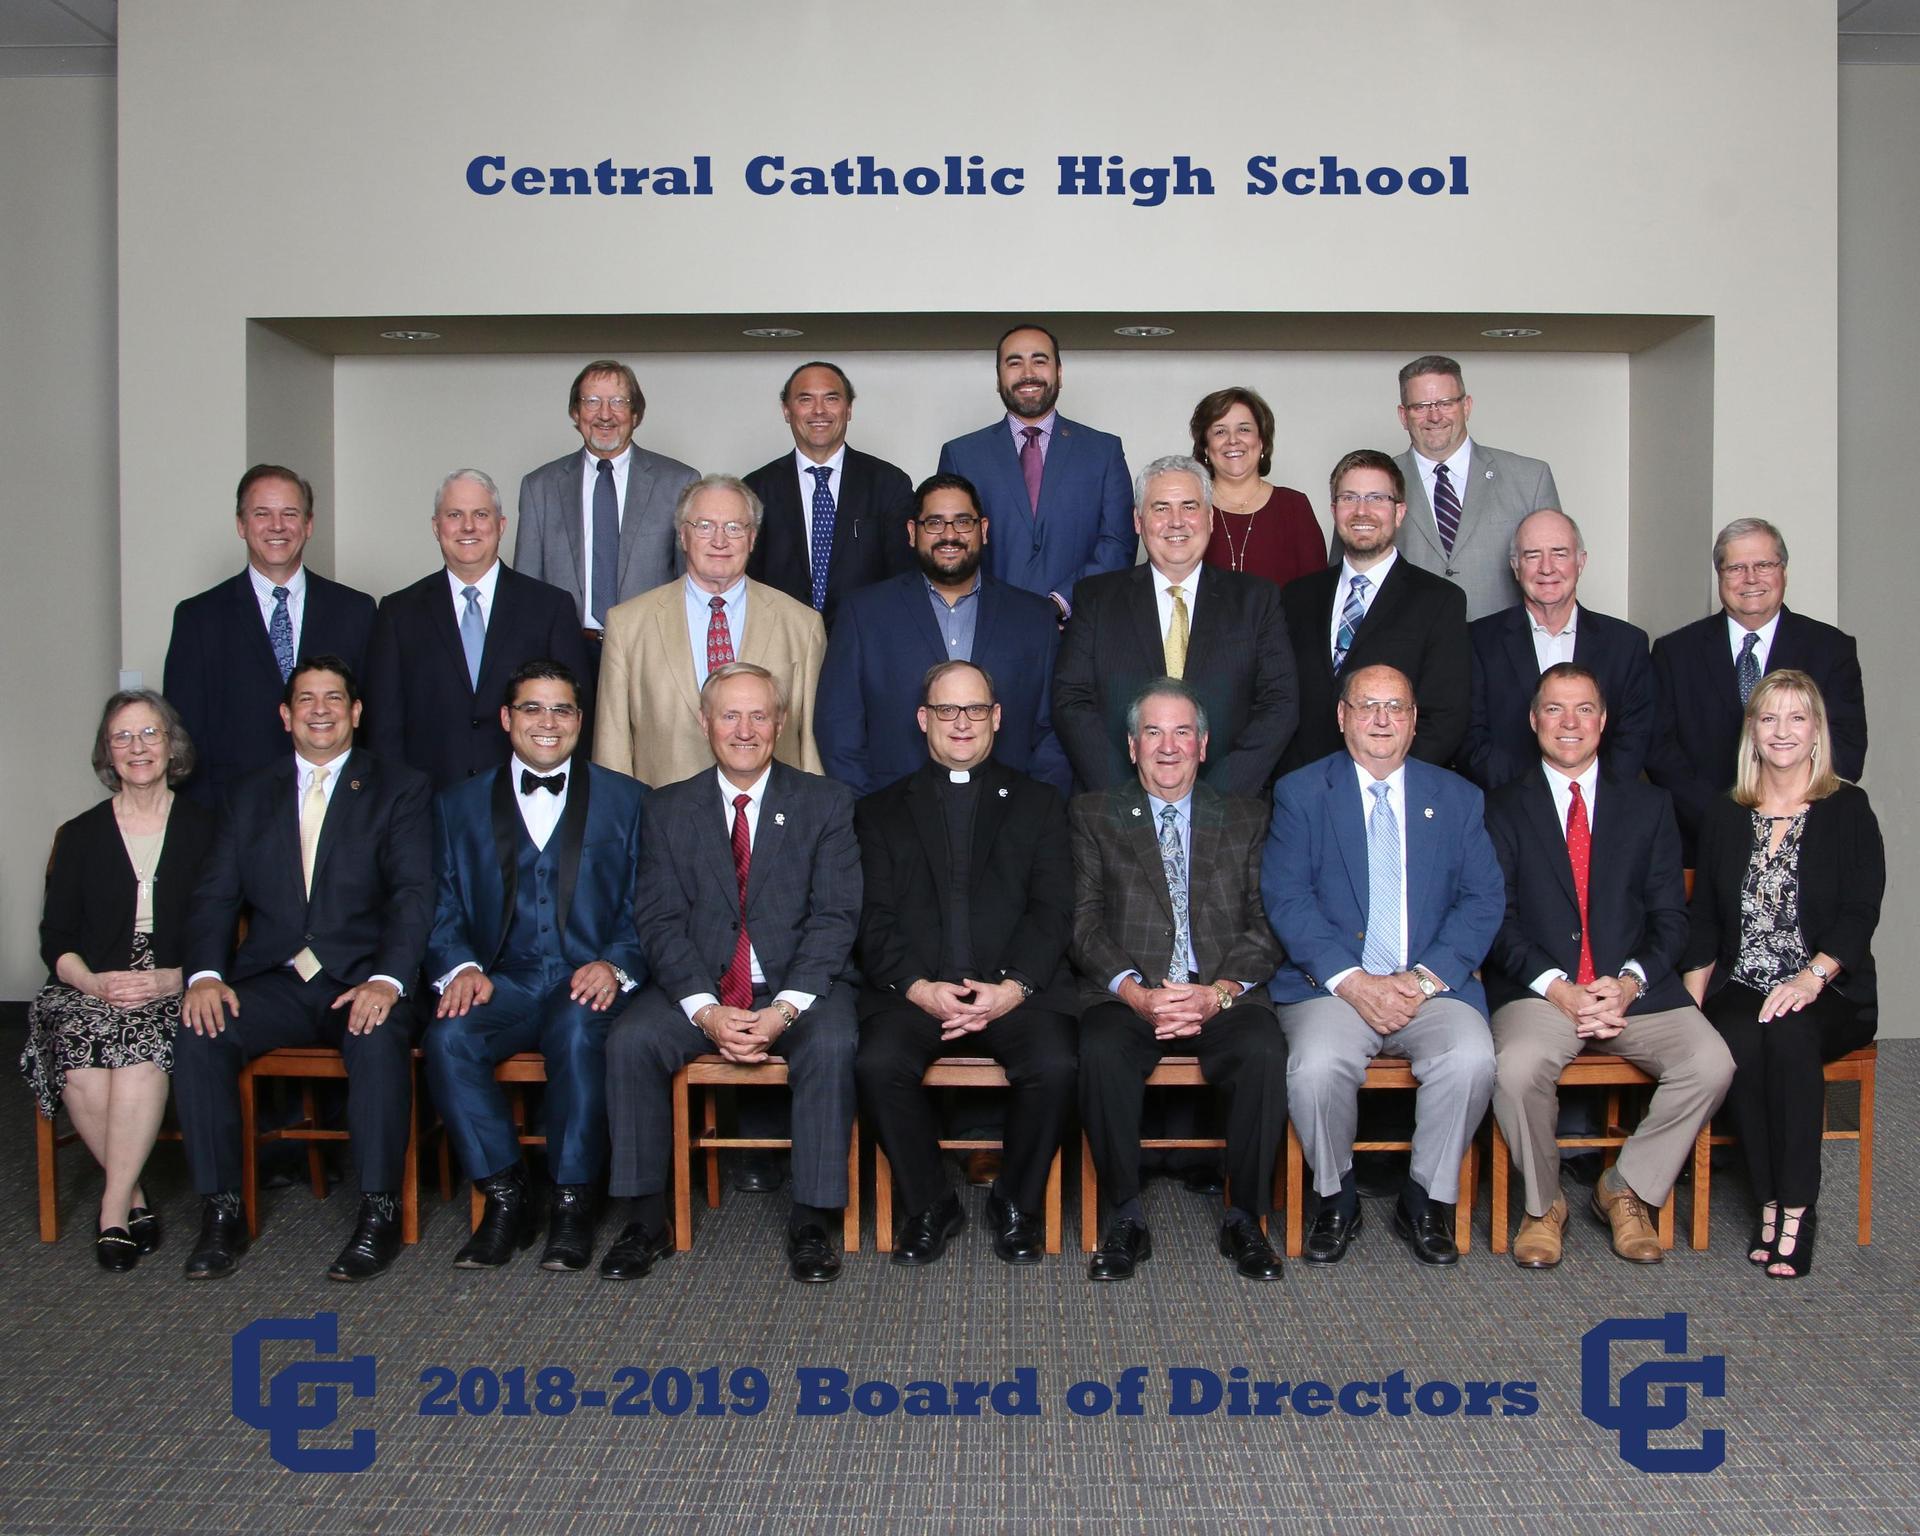 2018-2019 Board of Directors